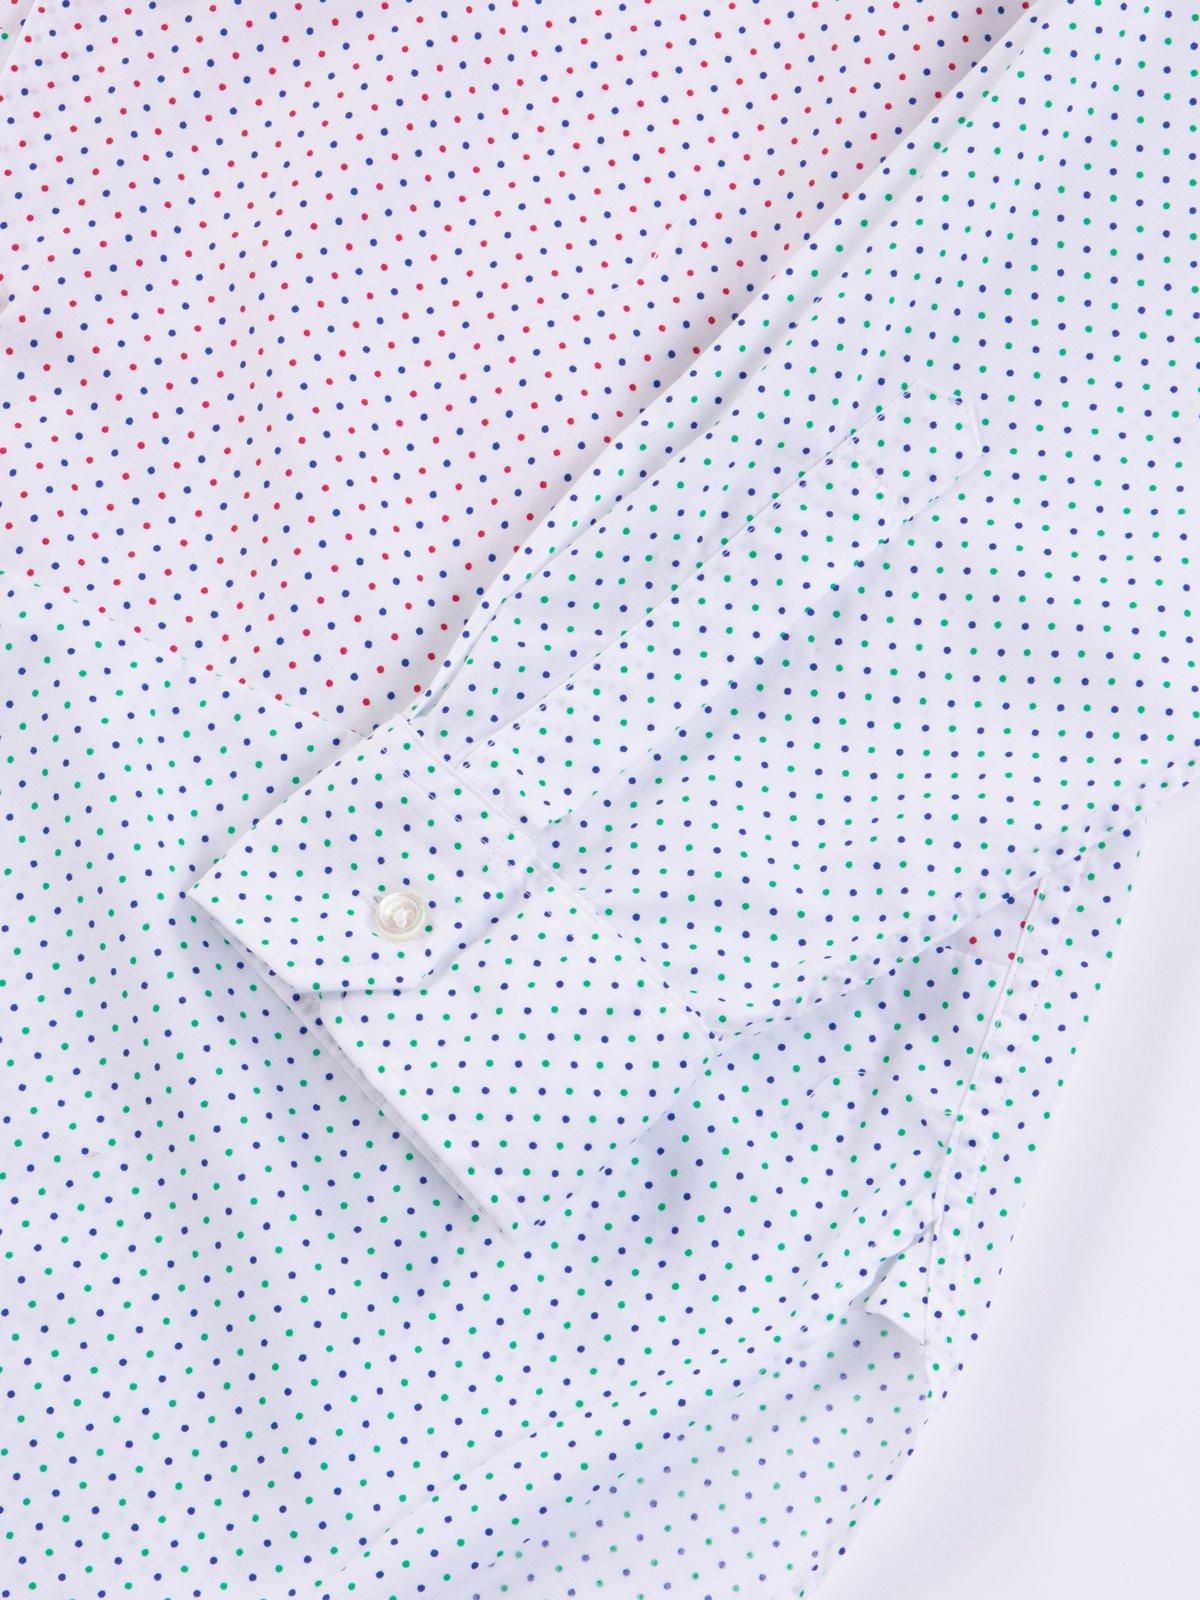 Red/Navy Small Polka Dot Spread Collar Shirt - Image 5